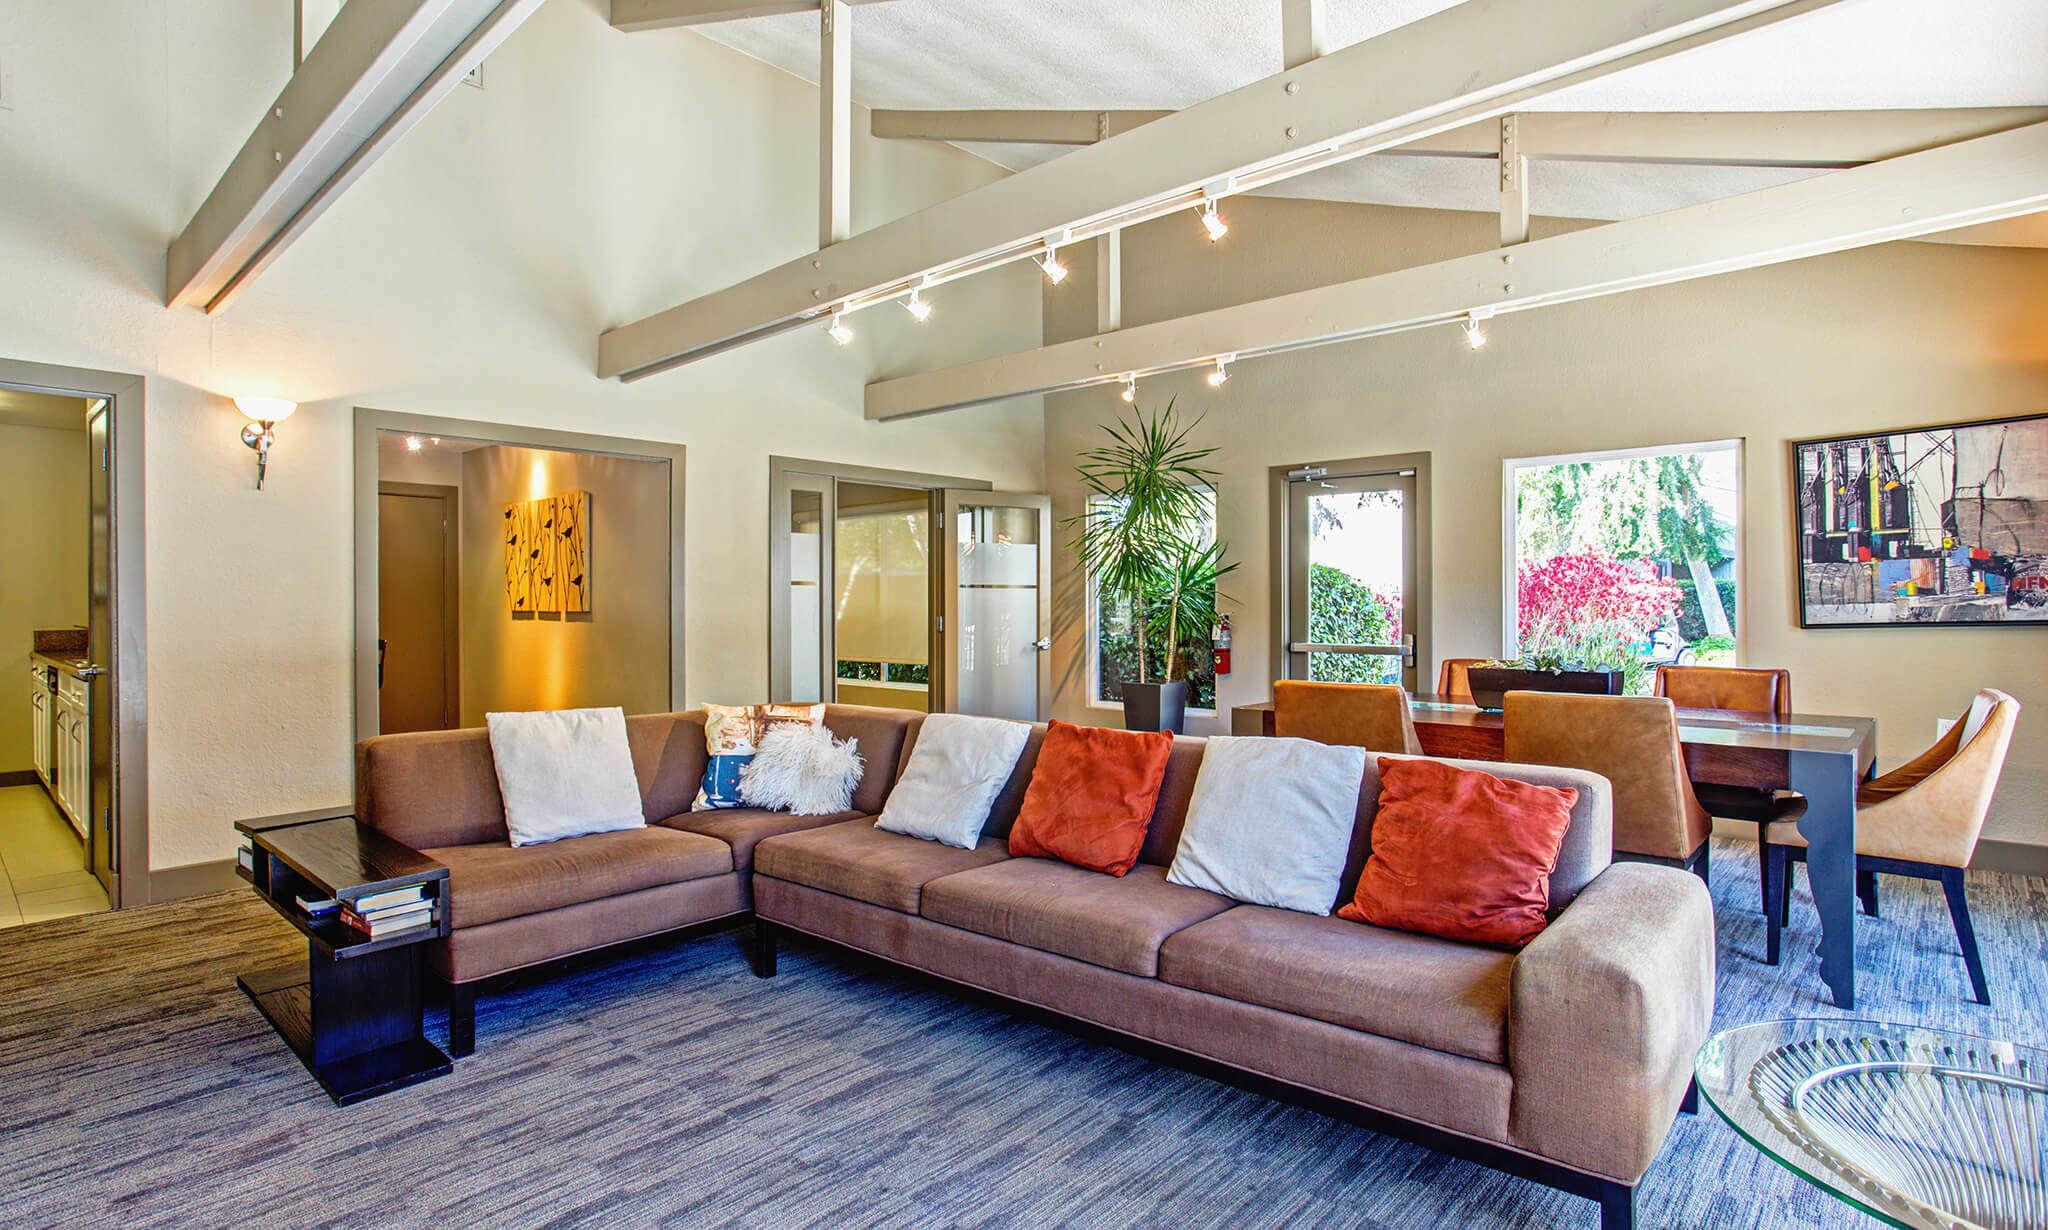 Boardwalk Apartments apartments in Santa Clara CA to rent photo 5